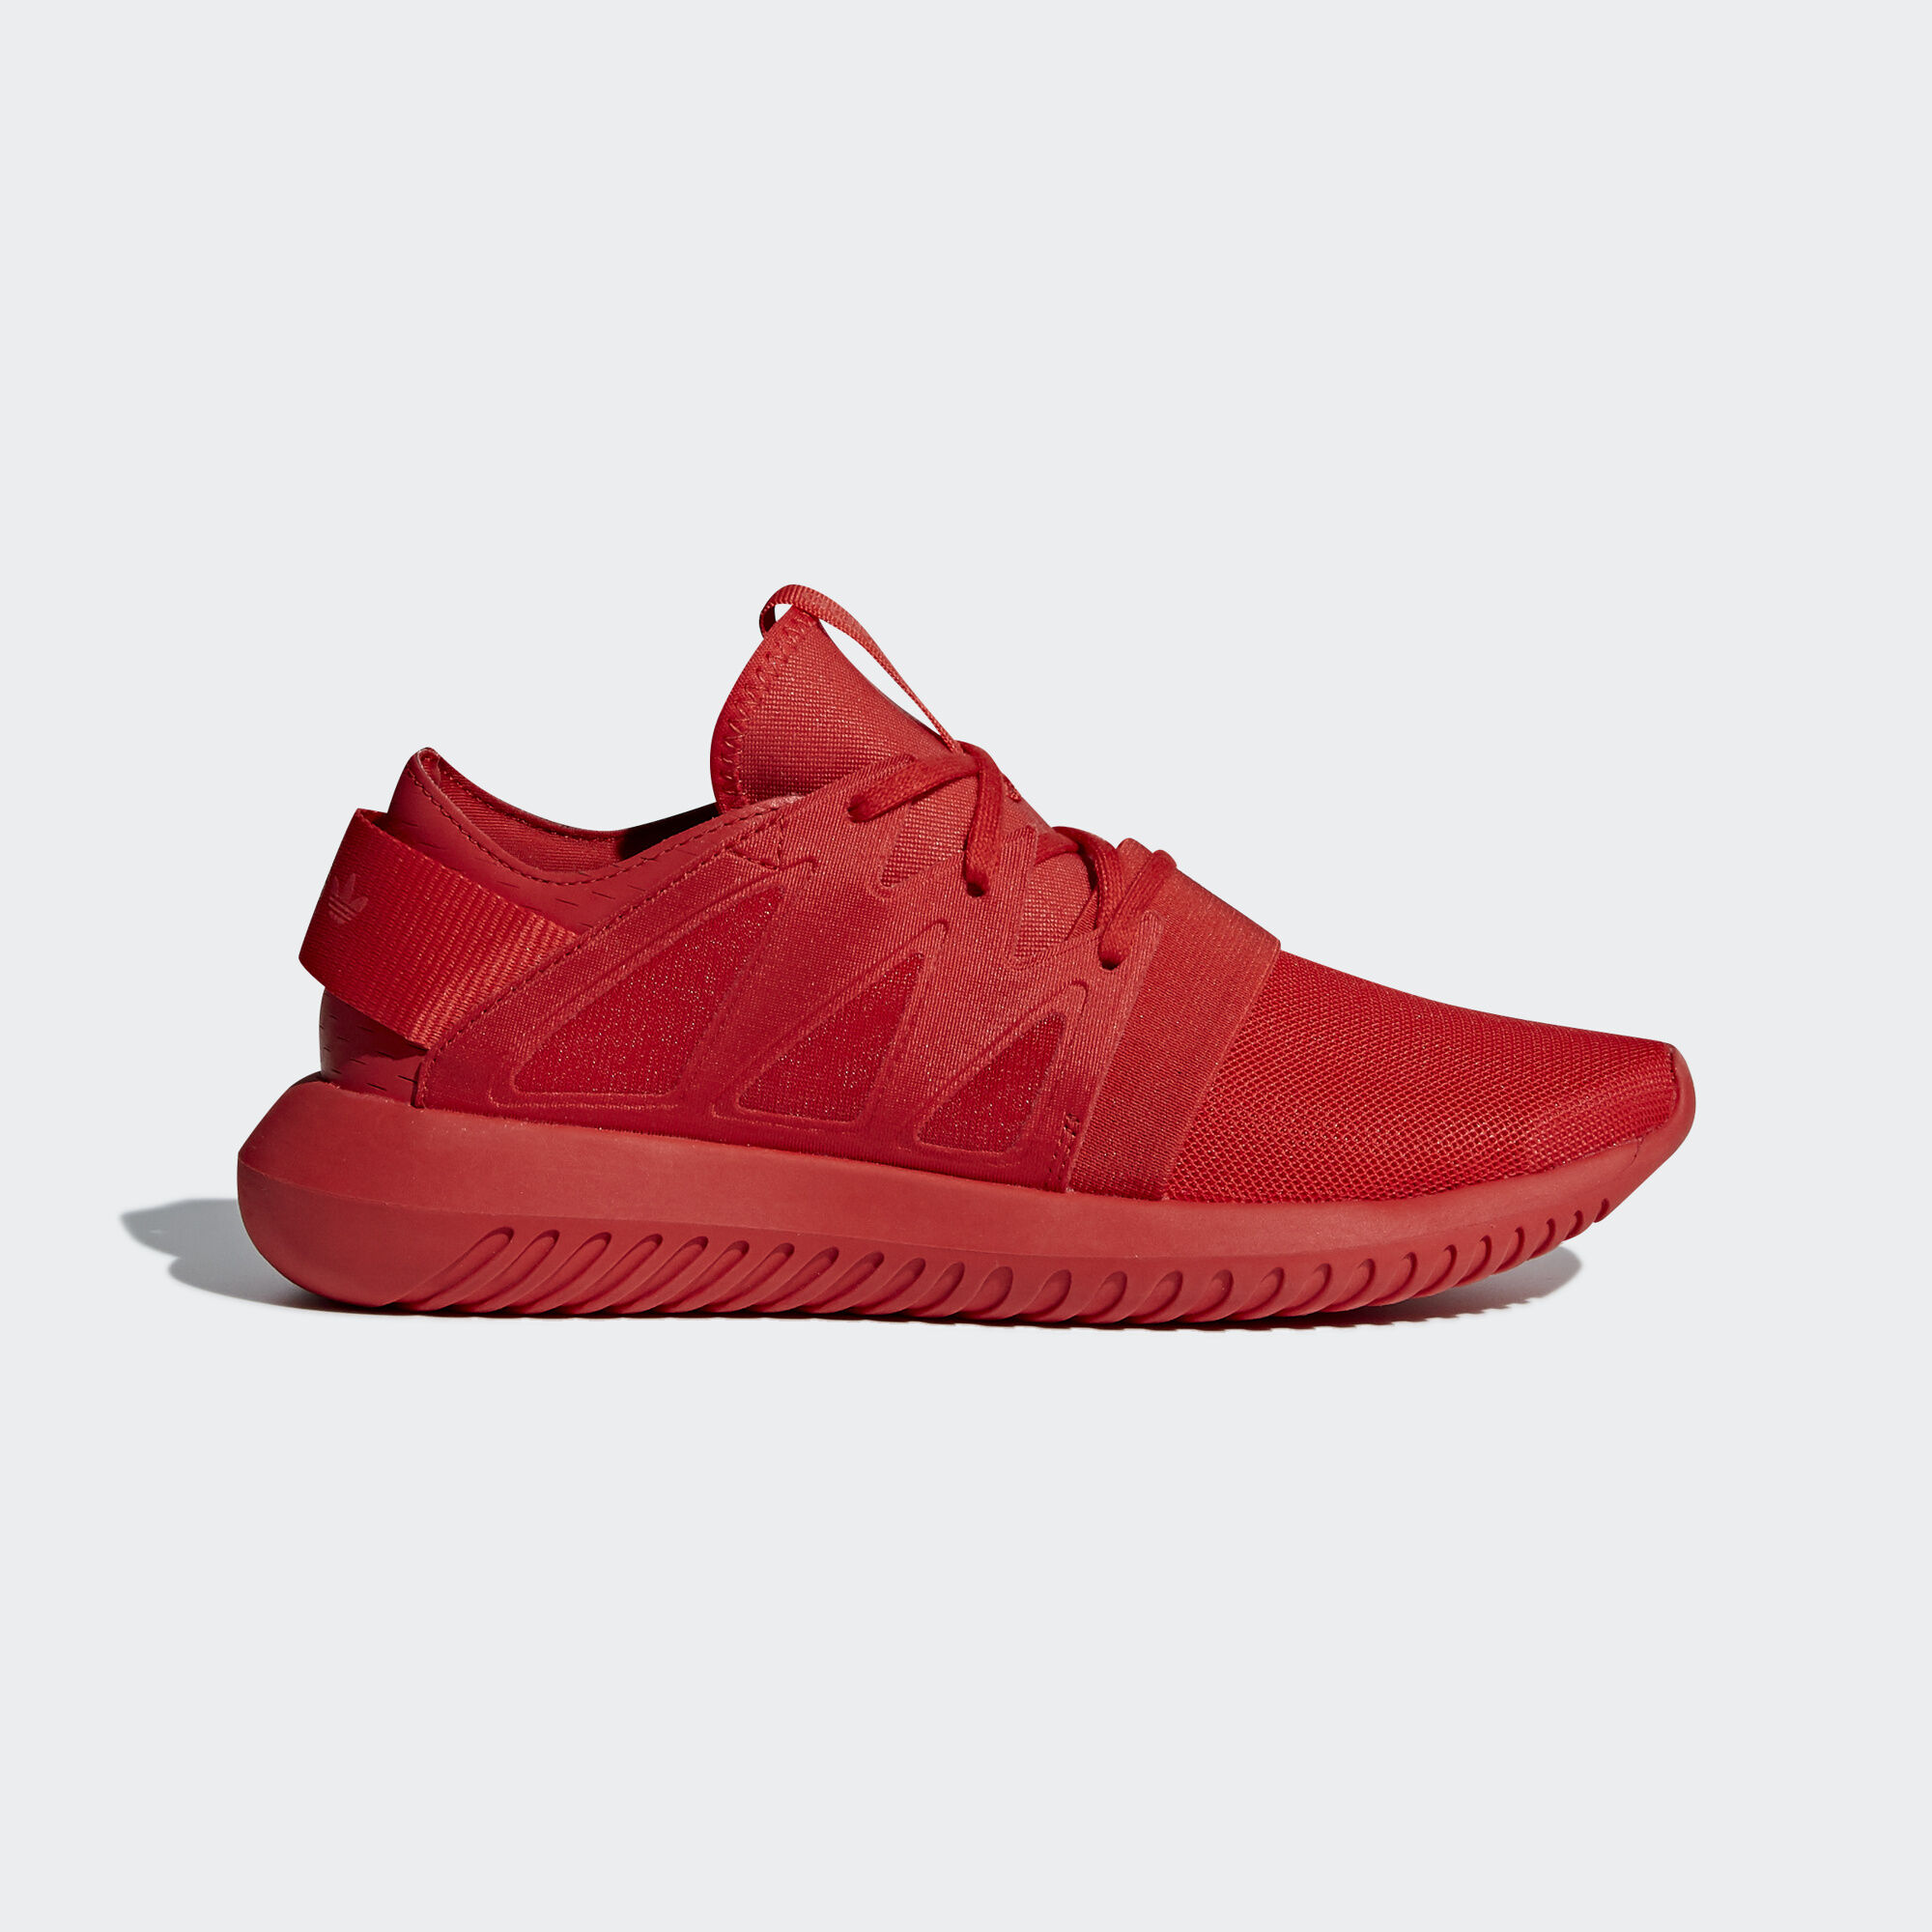 Adidas Tubular Viral Red